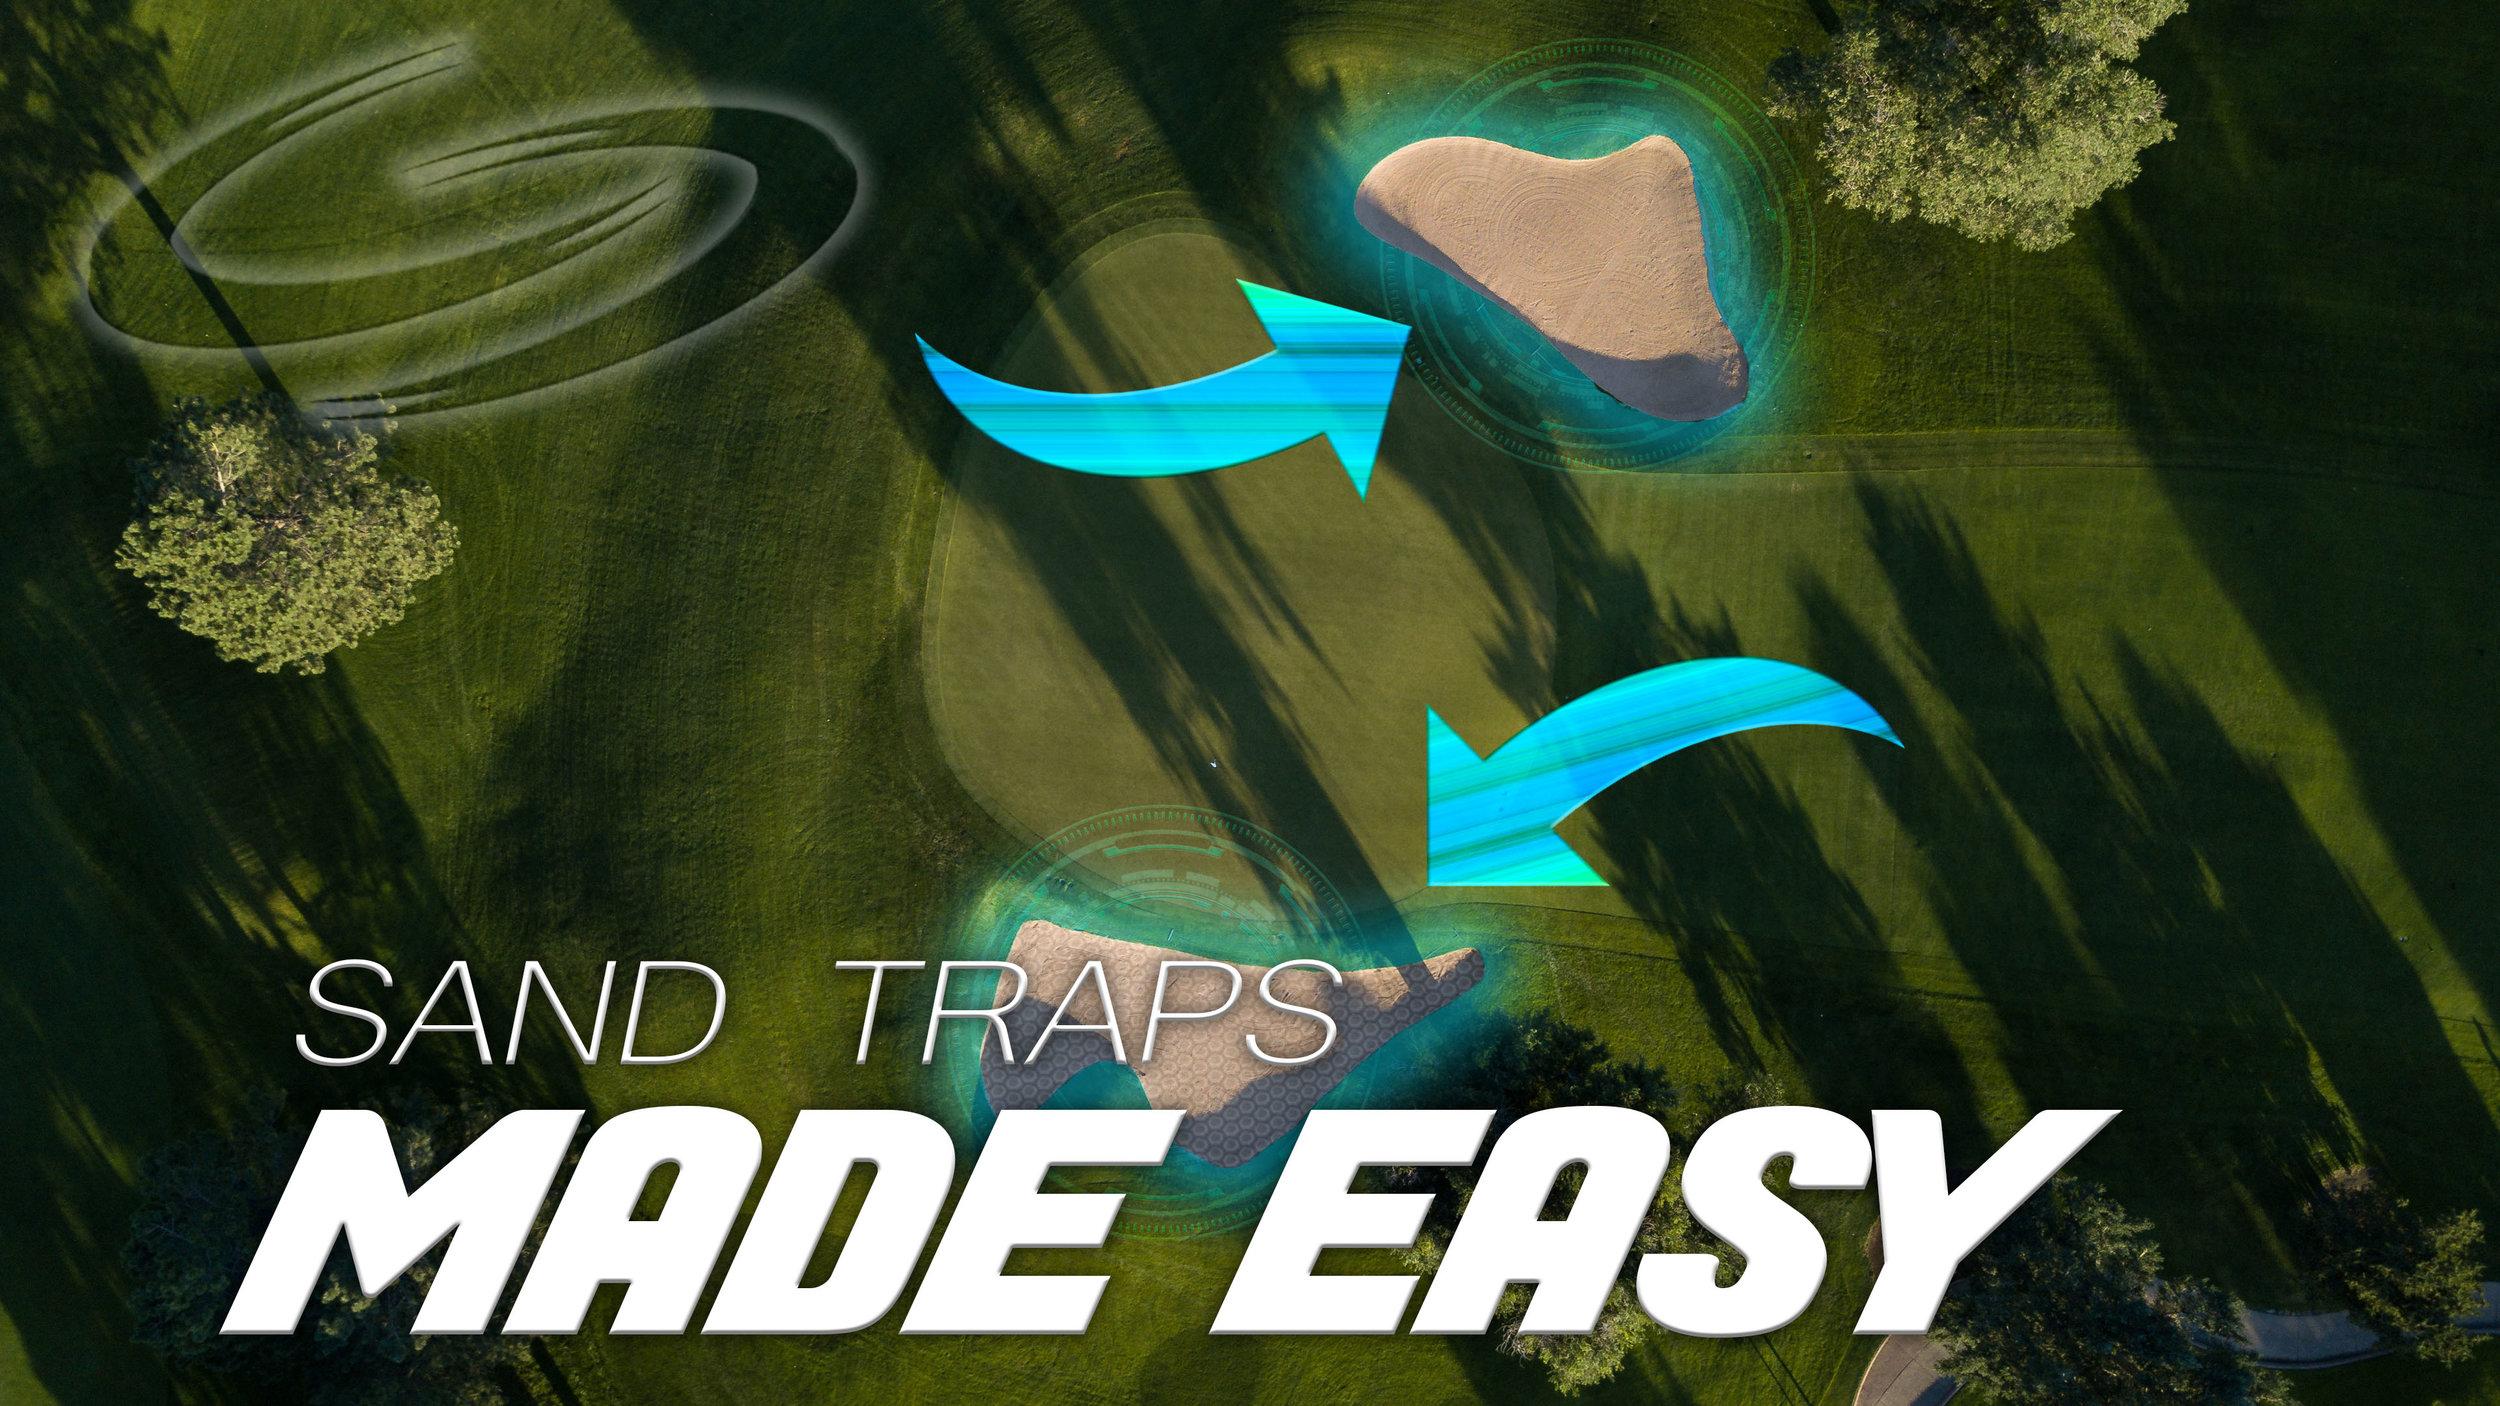 SAND TRAPS MADE EASY.jpg